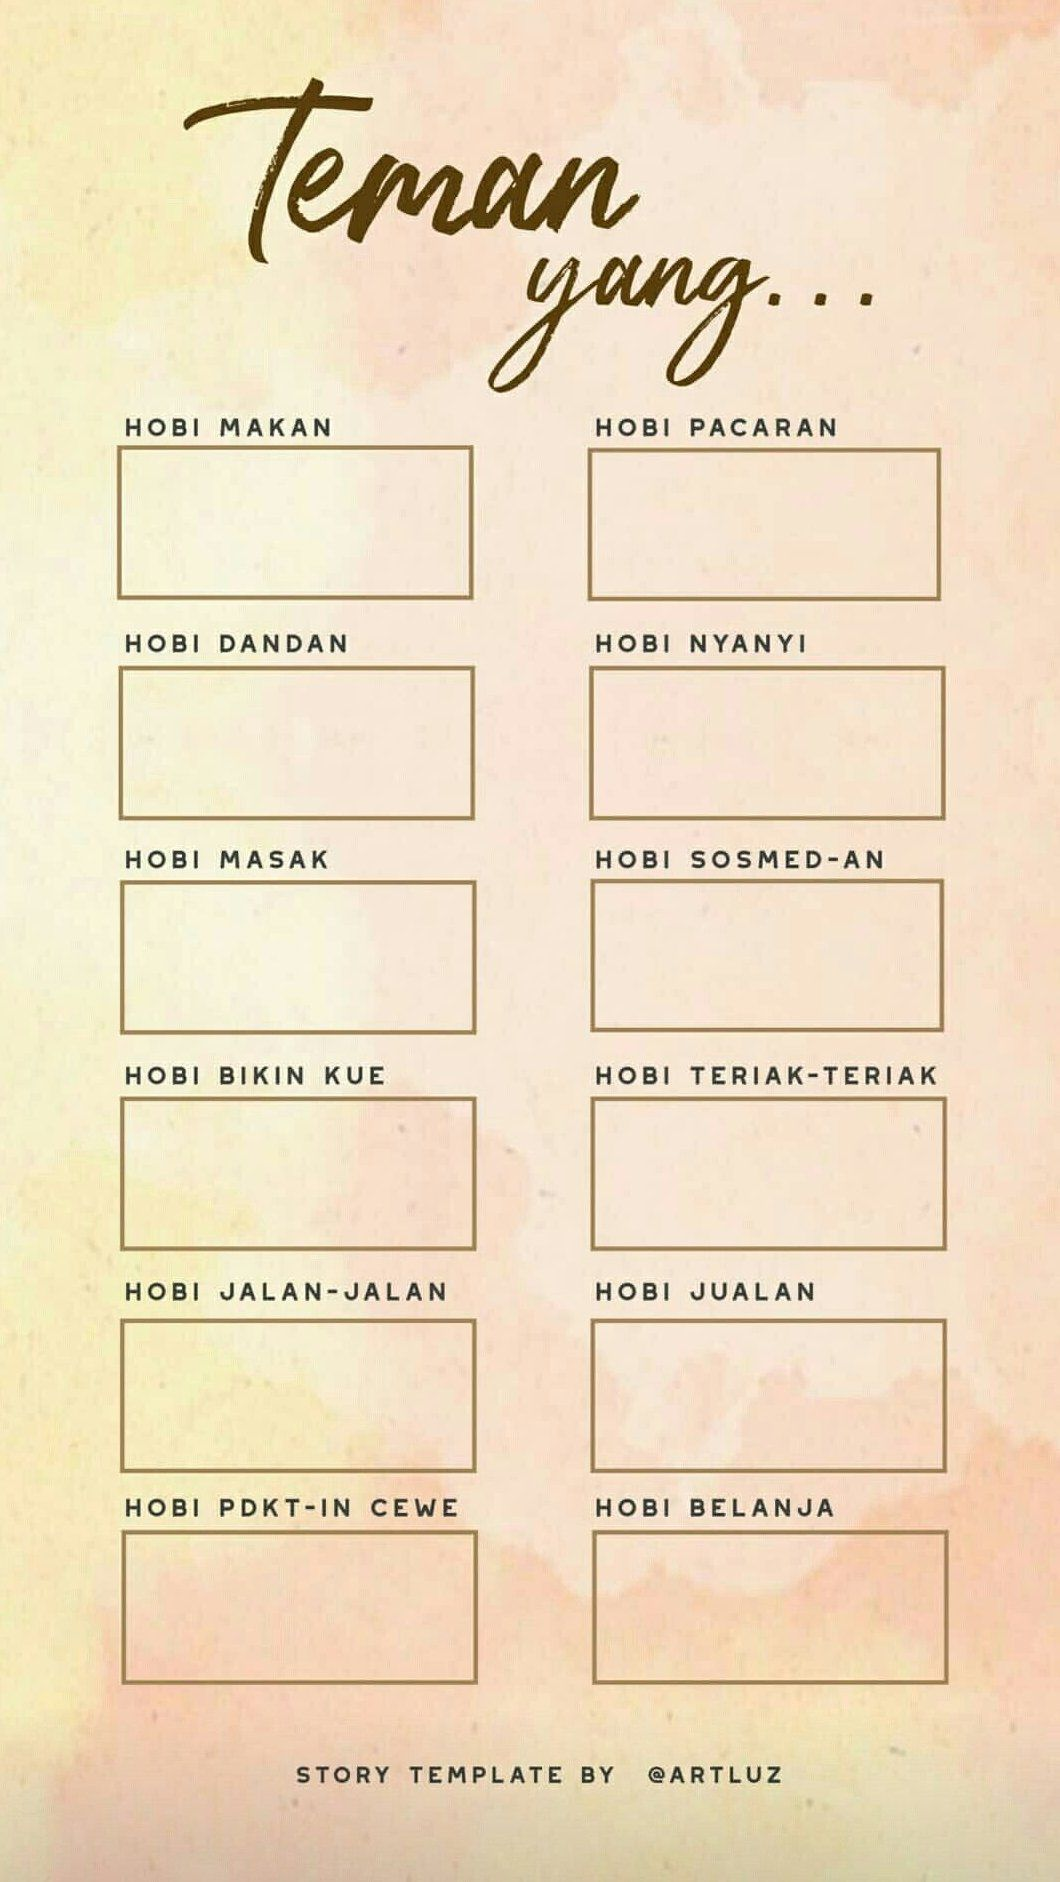 Templates Instagram Stories Indonesia Zodiak In 2020 Bingo Template Instagram Quotes Instagram Story Questions